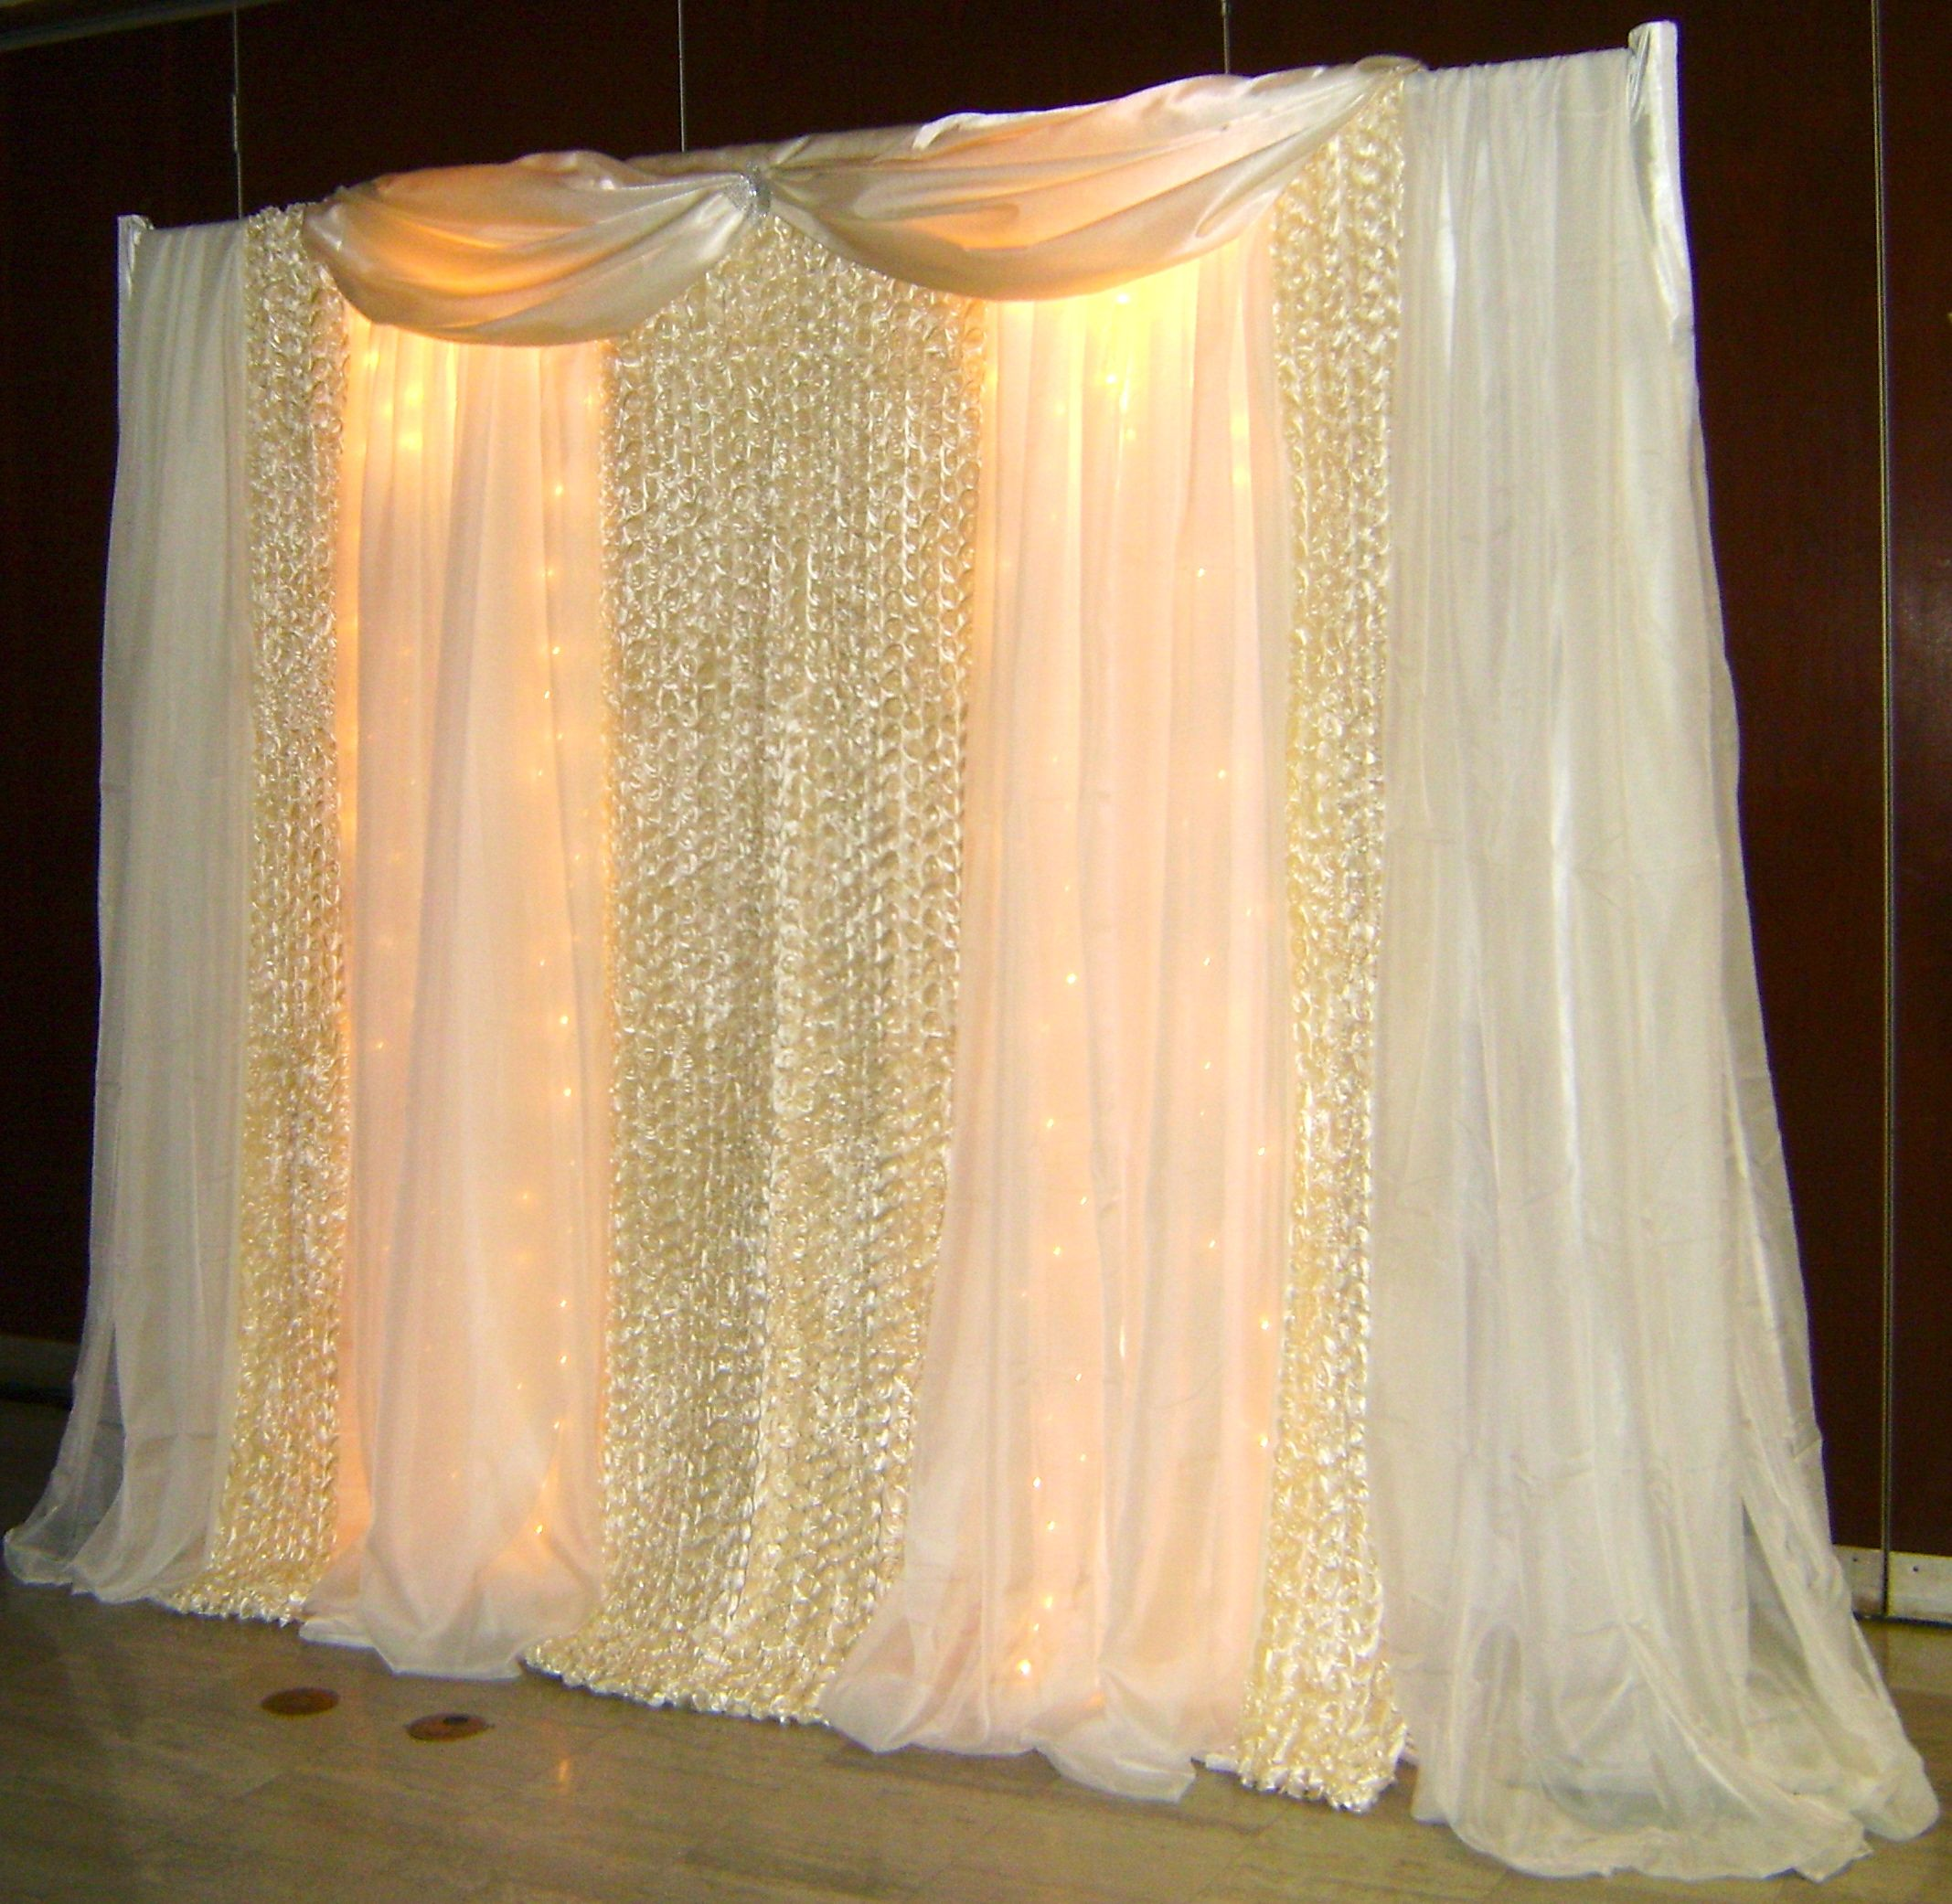 DIY Wedding Backdrops Ideas This backdrop is designed